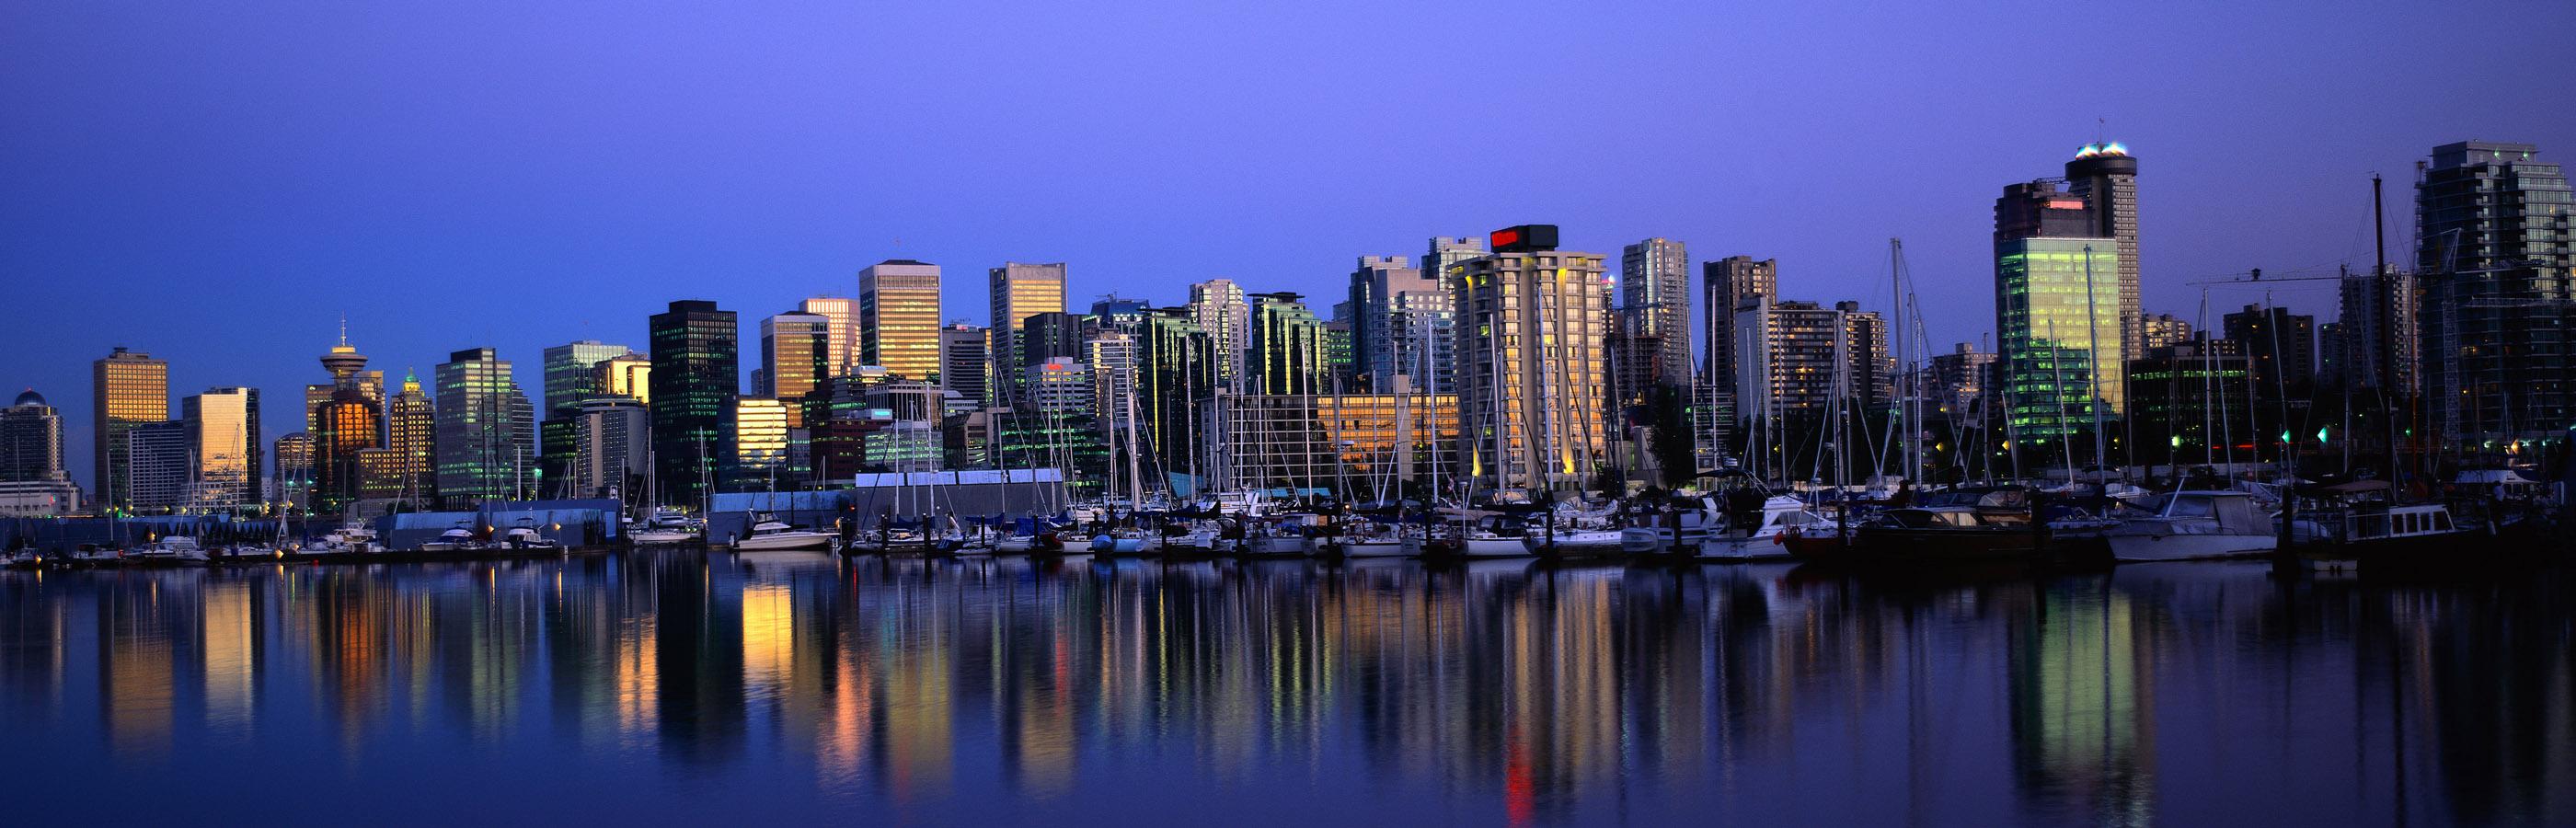 Vancouver Skyline Desktop and mobile wallpaper Wallippo 2800x900